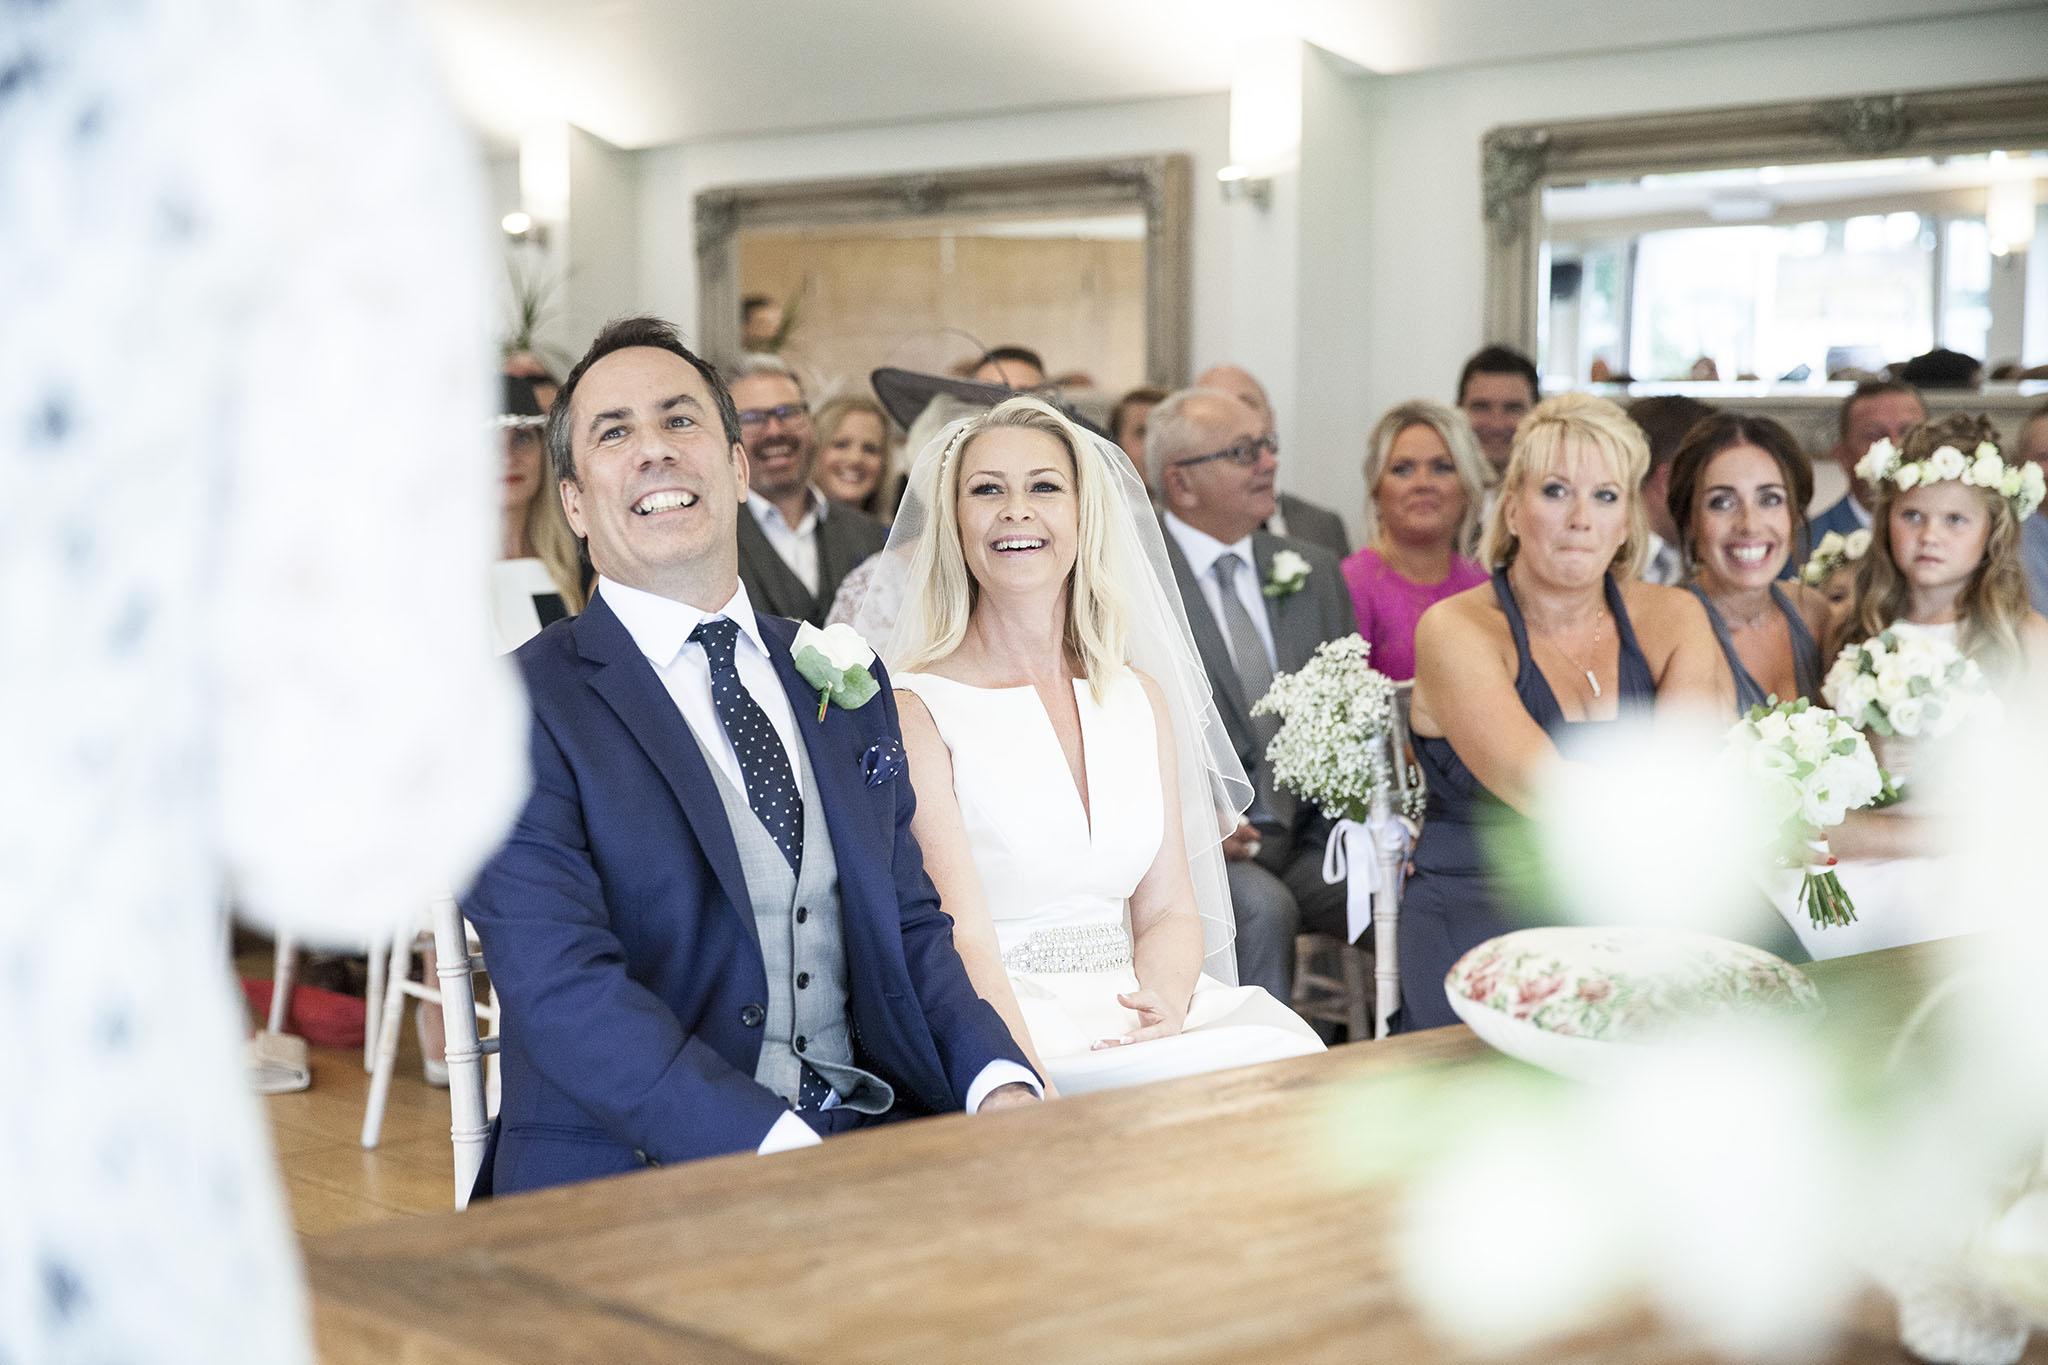 elizabethg_photography_hertfordshire_fineart_photographer_tonycharlie_wedding_photography_aldermaston_wasing_park_reading_24.jpg